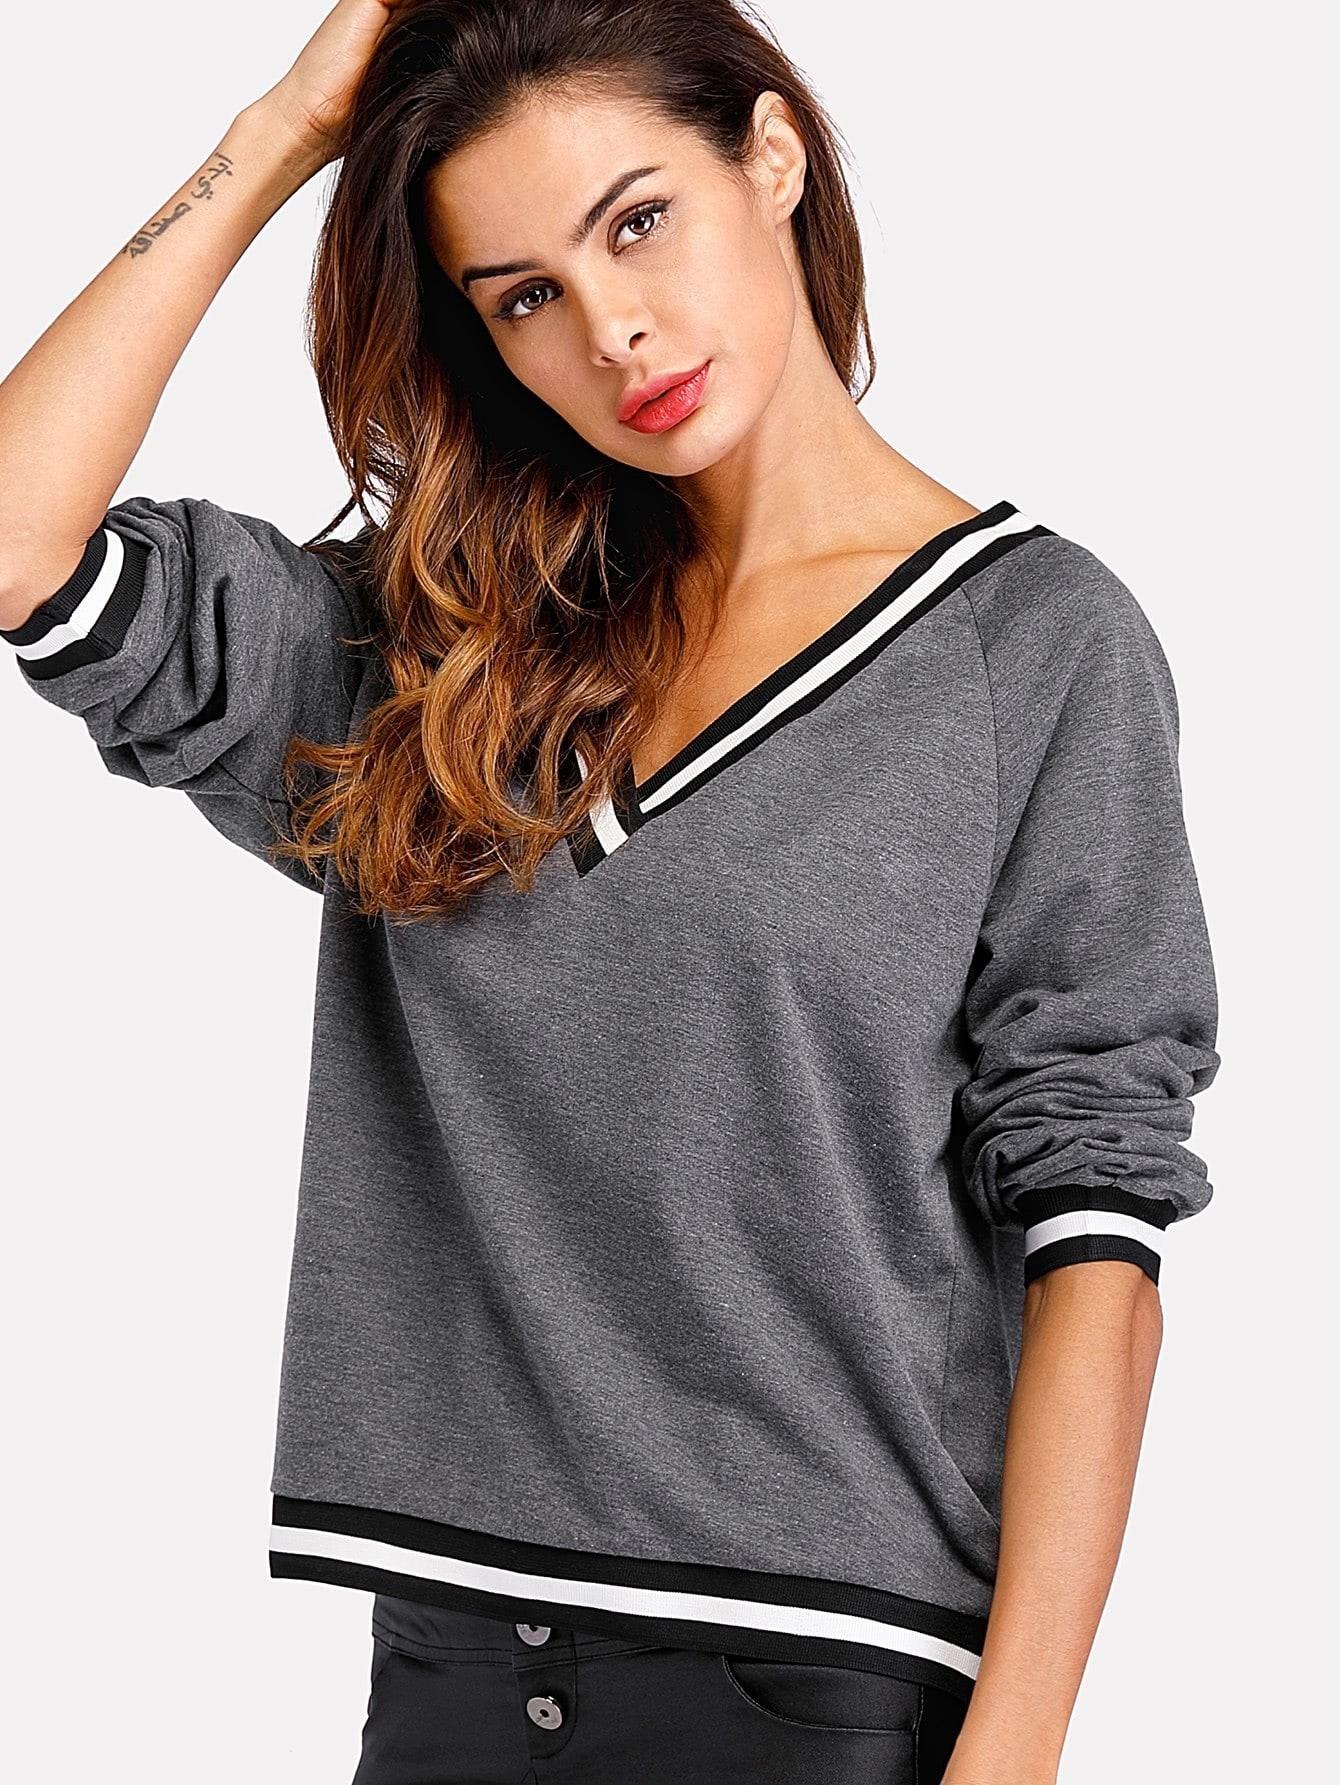 купить Contrast Striped Trim Marled Sweatshirt недорого